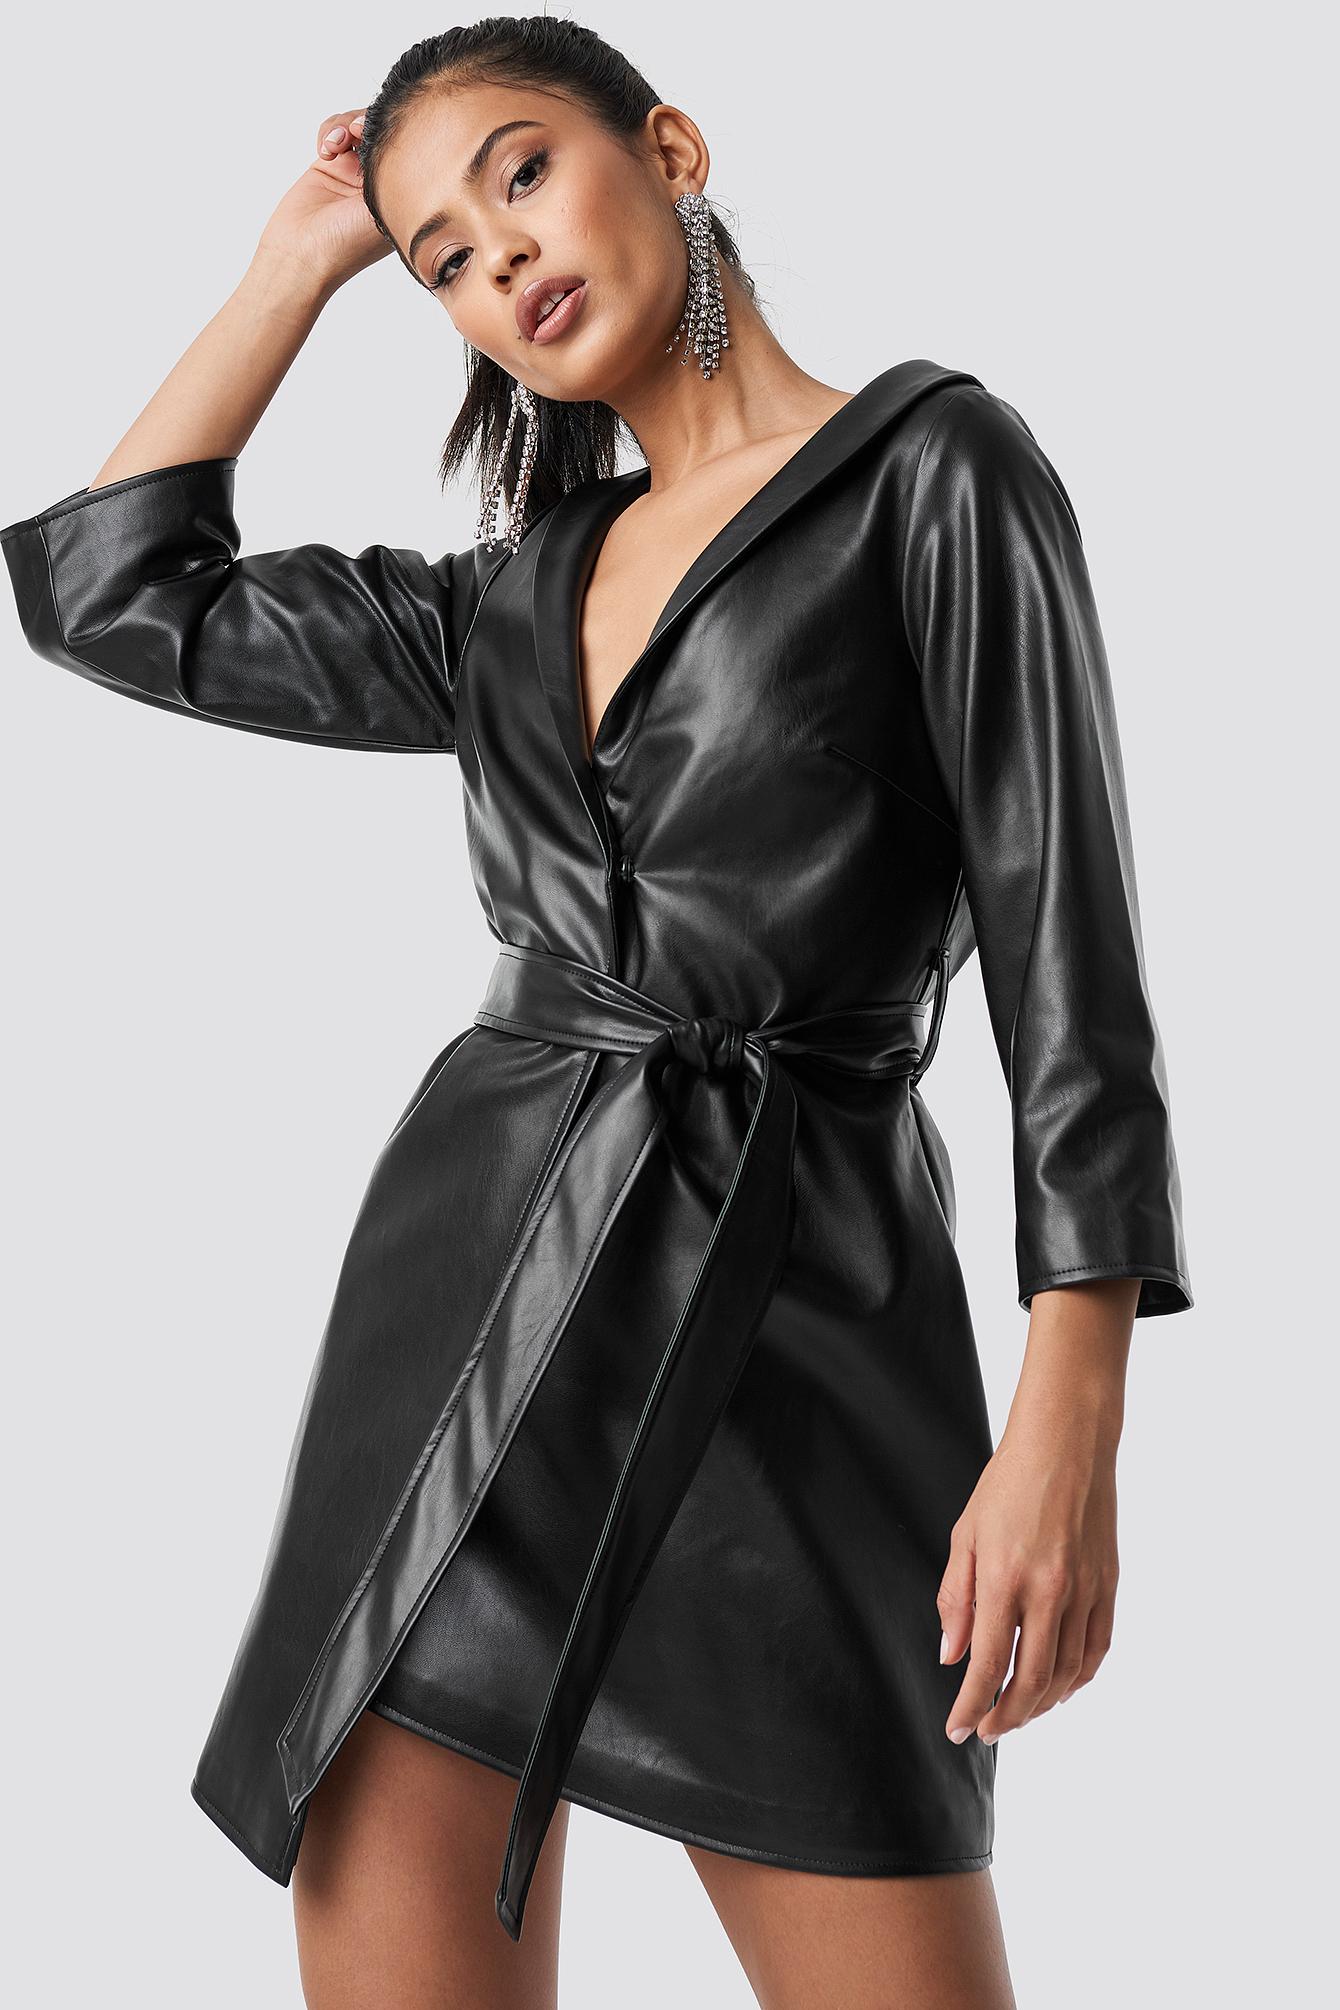 hannalicious x na-kd -  Faux Leather Blazer Dress - Black